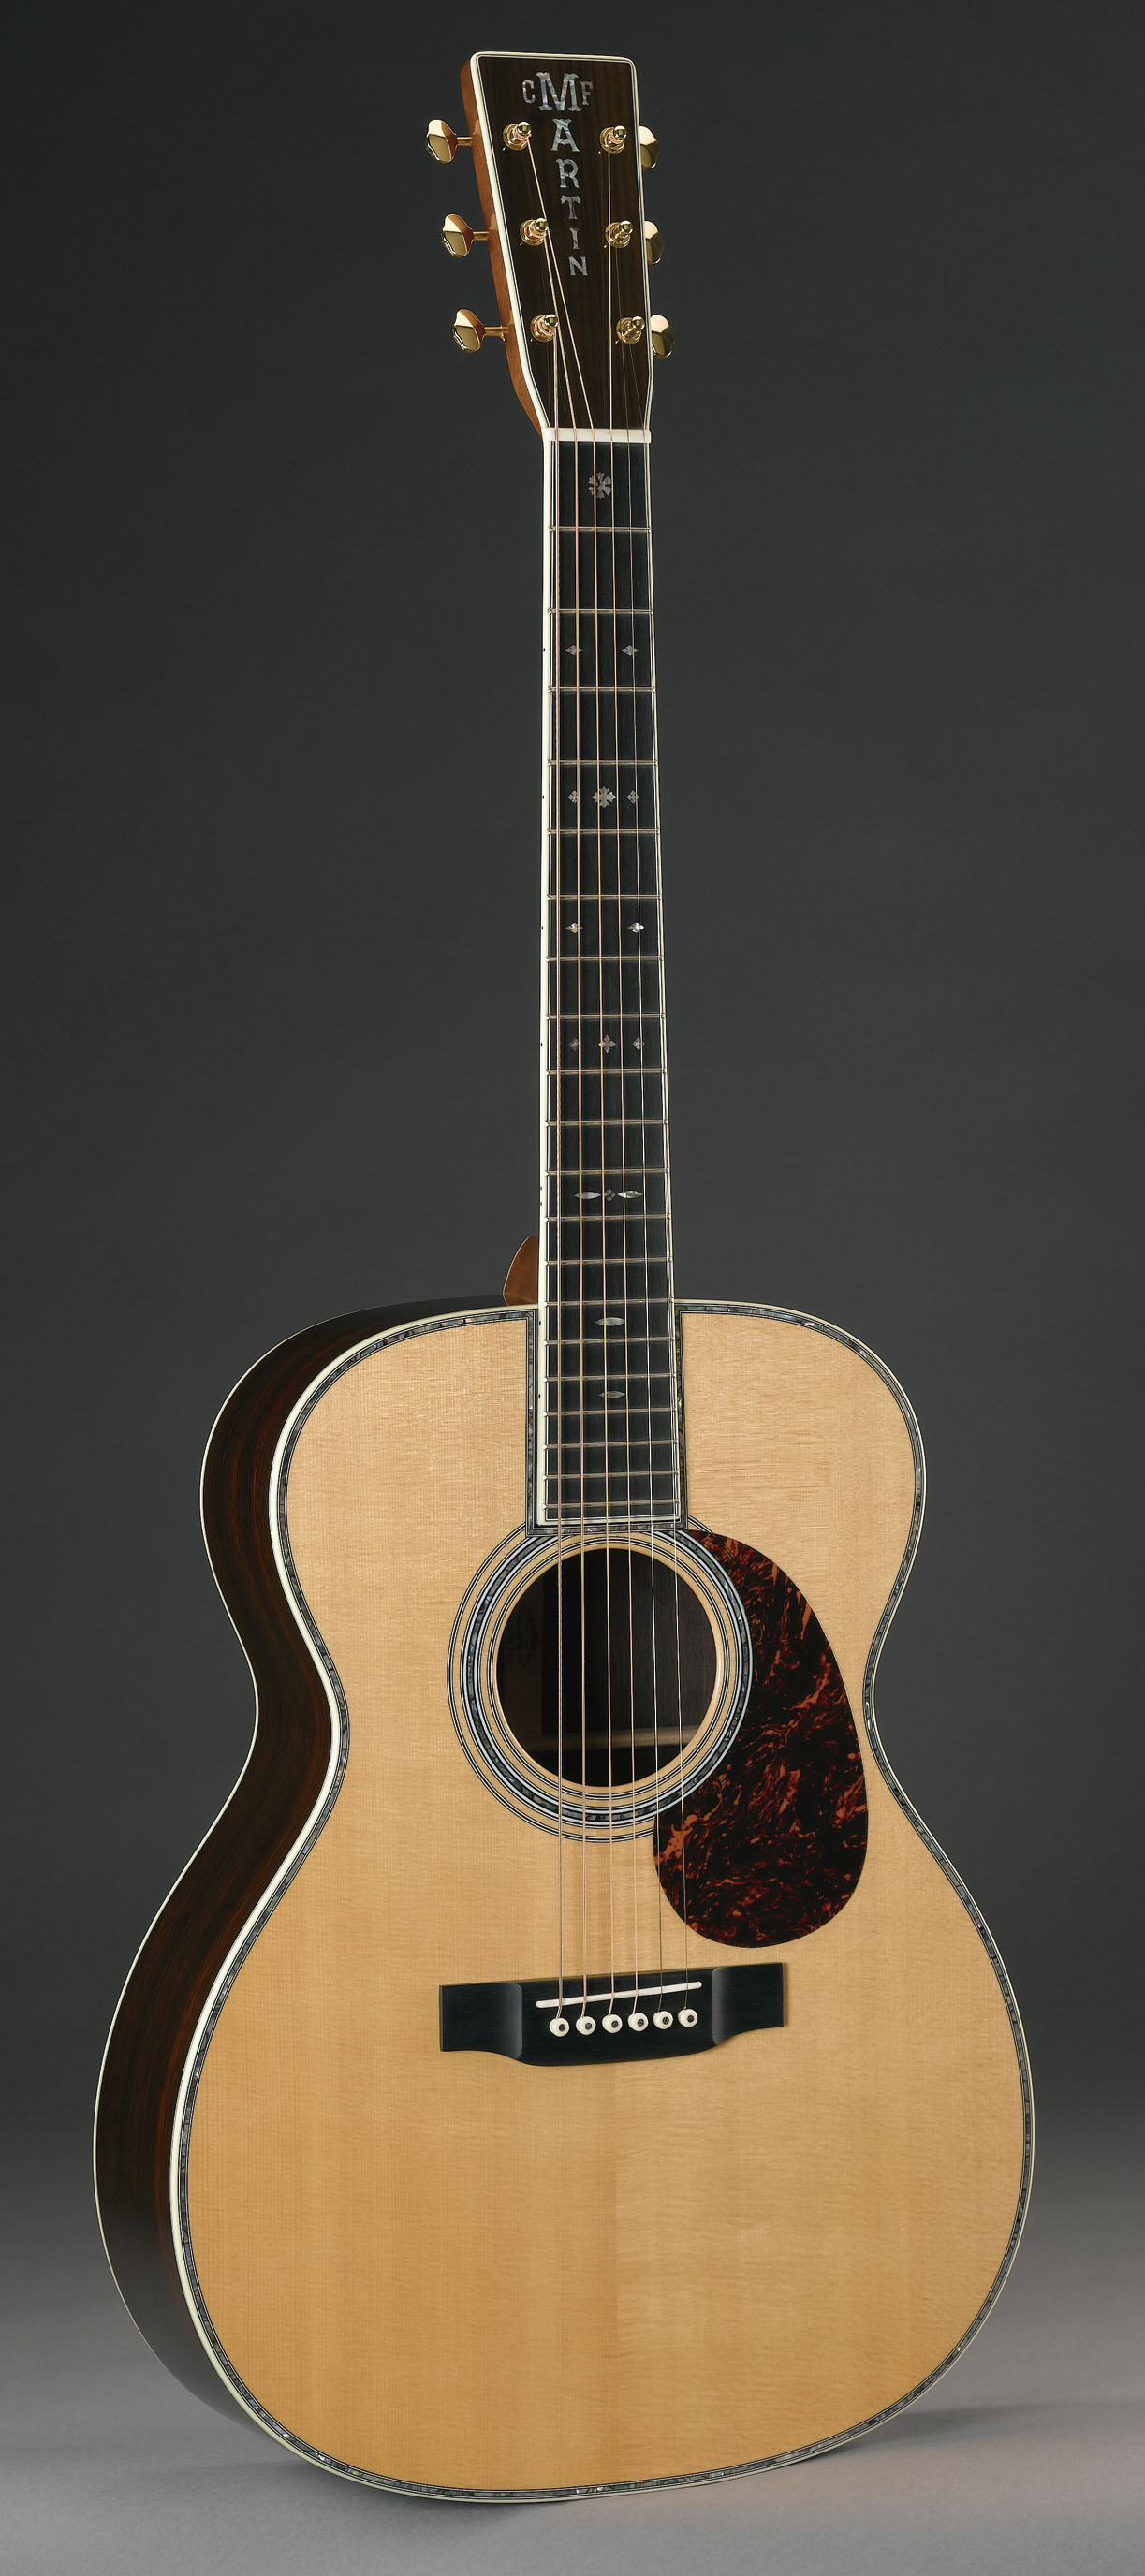 C.F. Martin 000-42 w/case